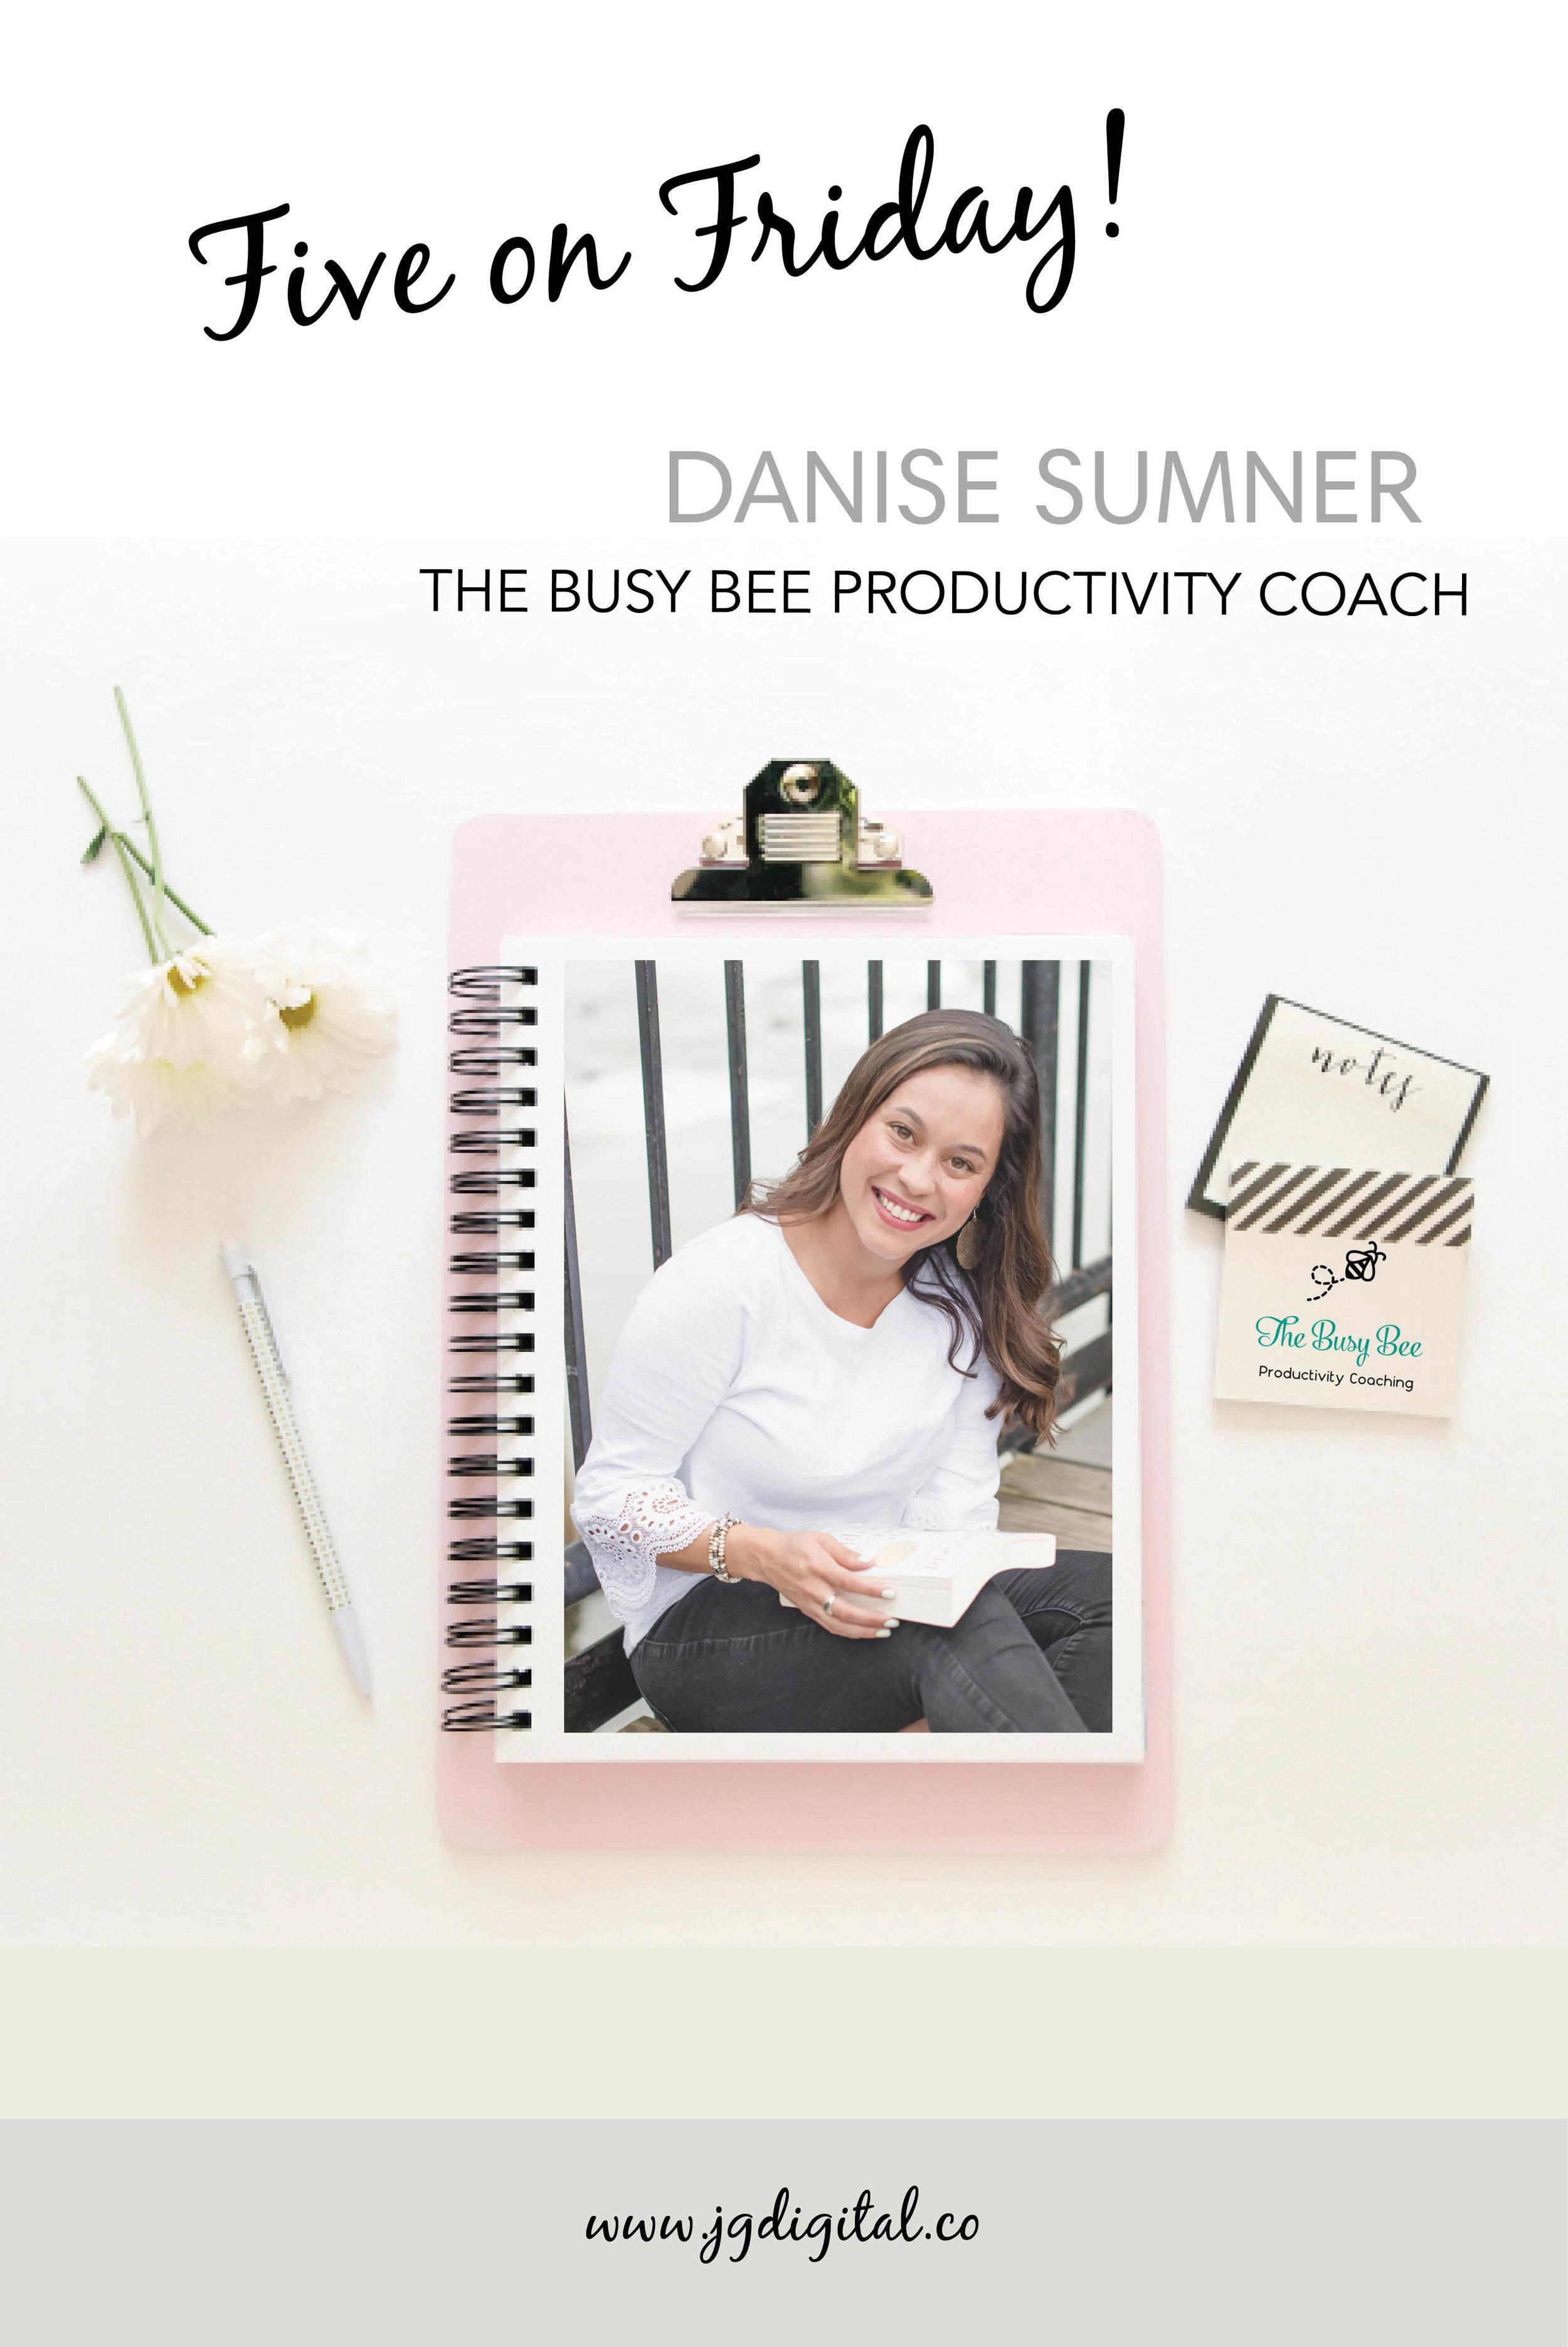 Women_in_Business_Danise_Sumner_Busy_Bee_Productivity_Coaching